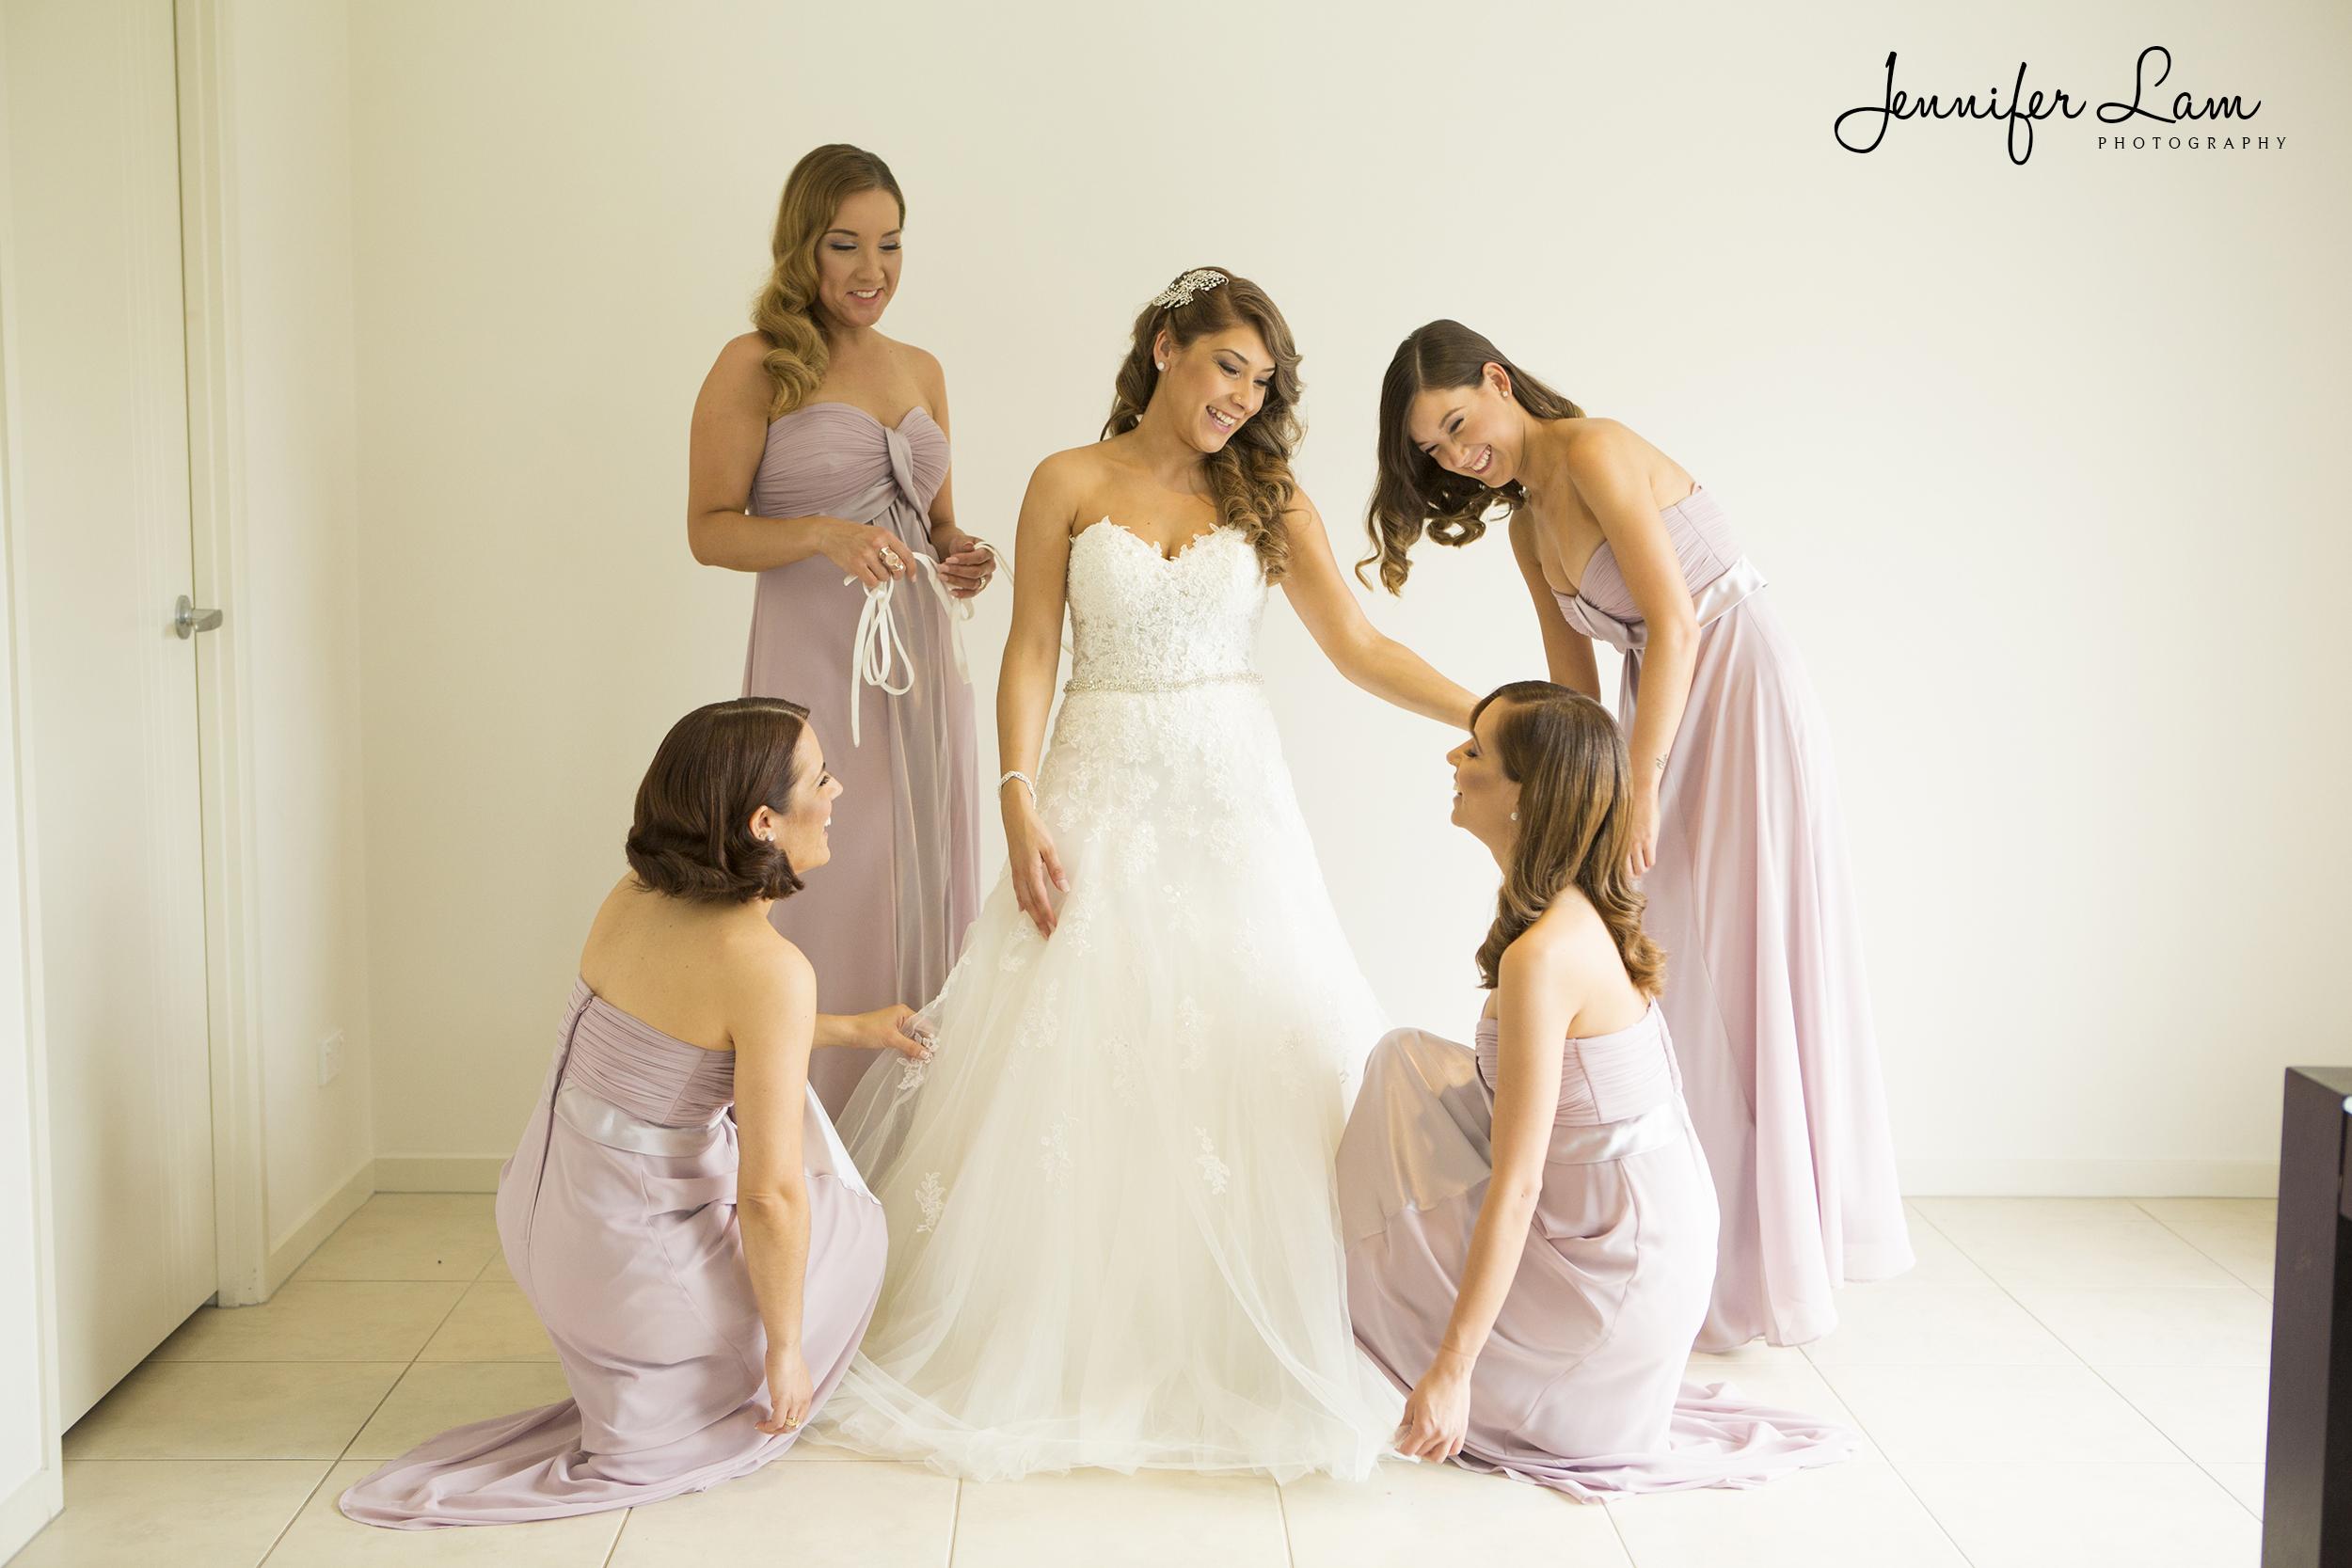 M+A - Jennifer Lam Photography (9).jpg